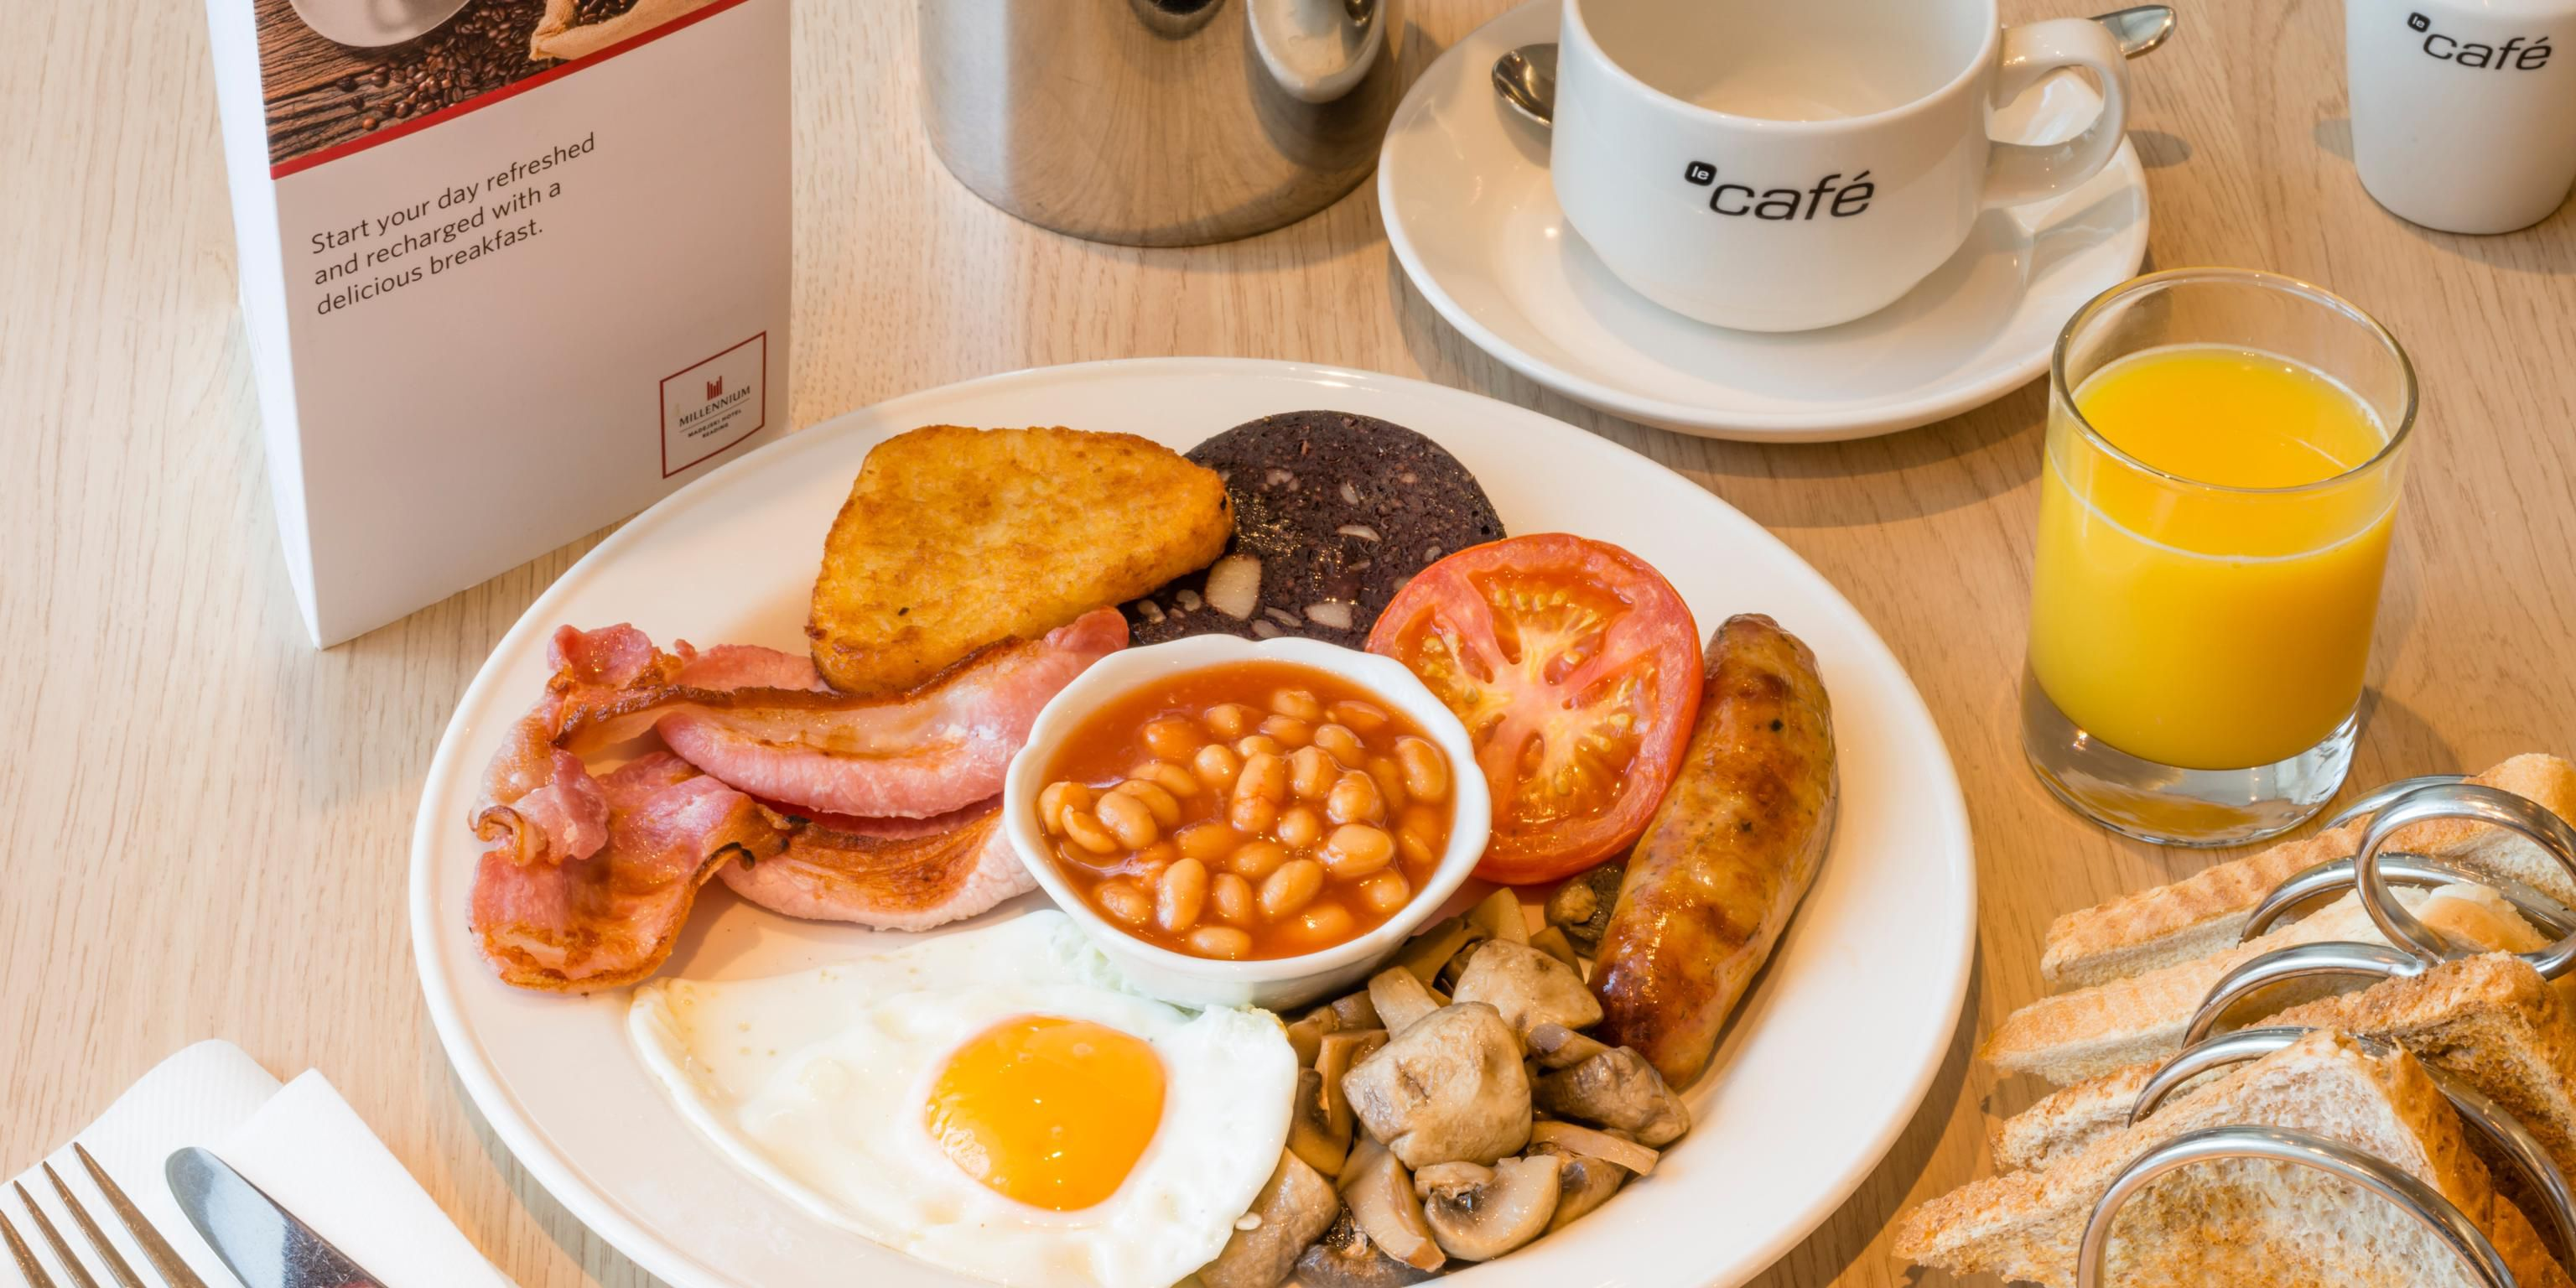 Full English Breakfast in Le Cafe Restaurant